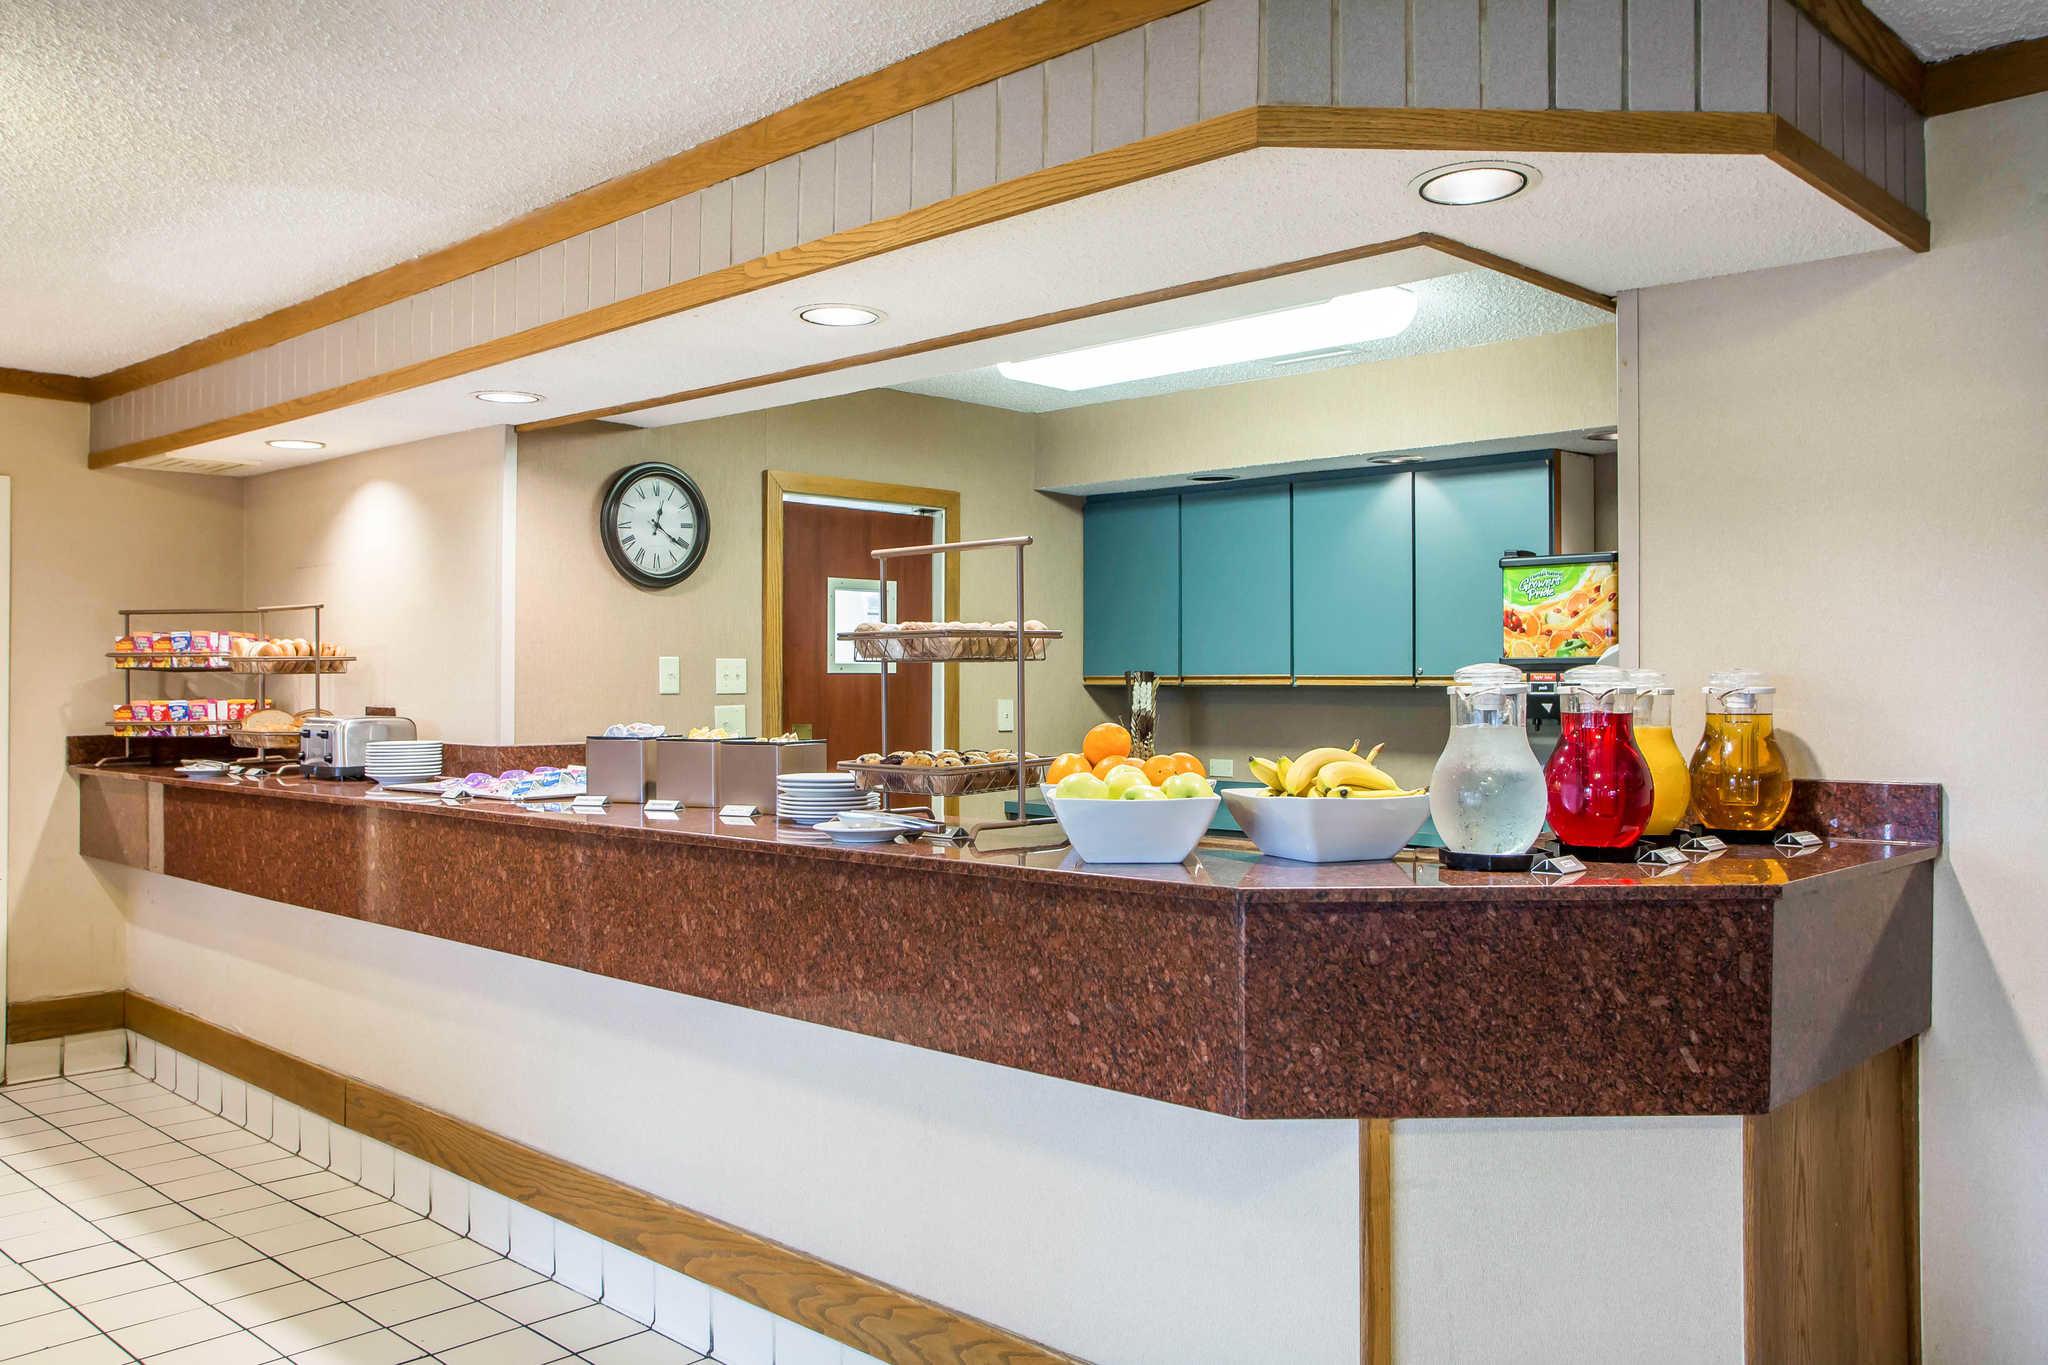 Clarion Inn image 28